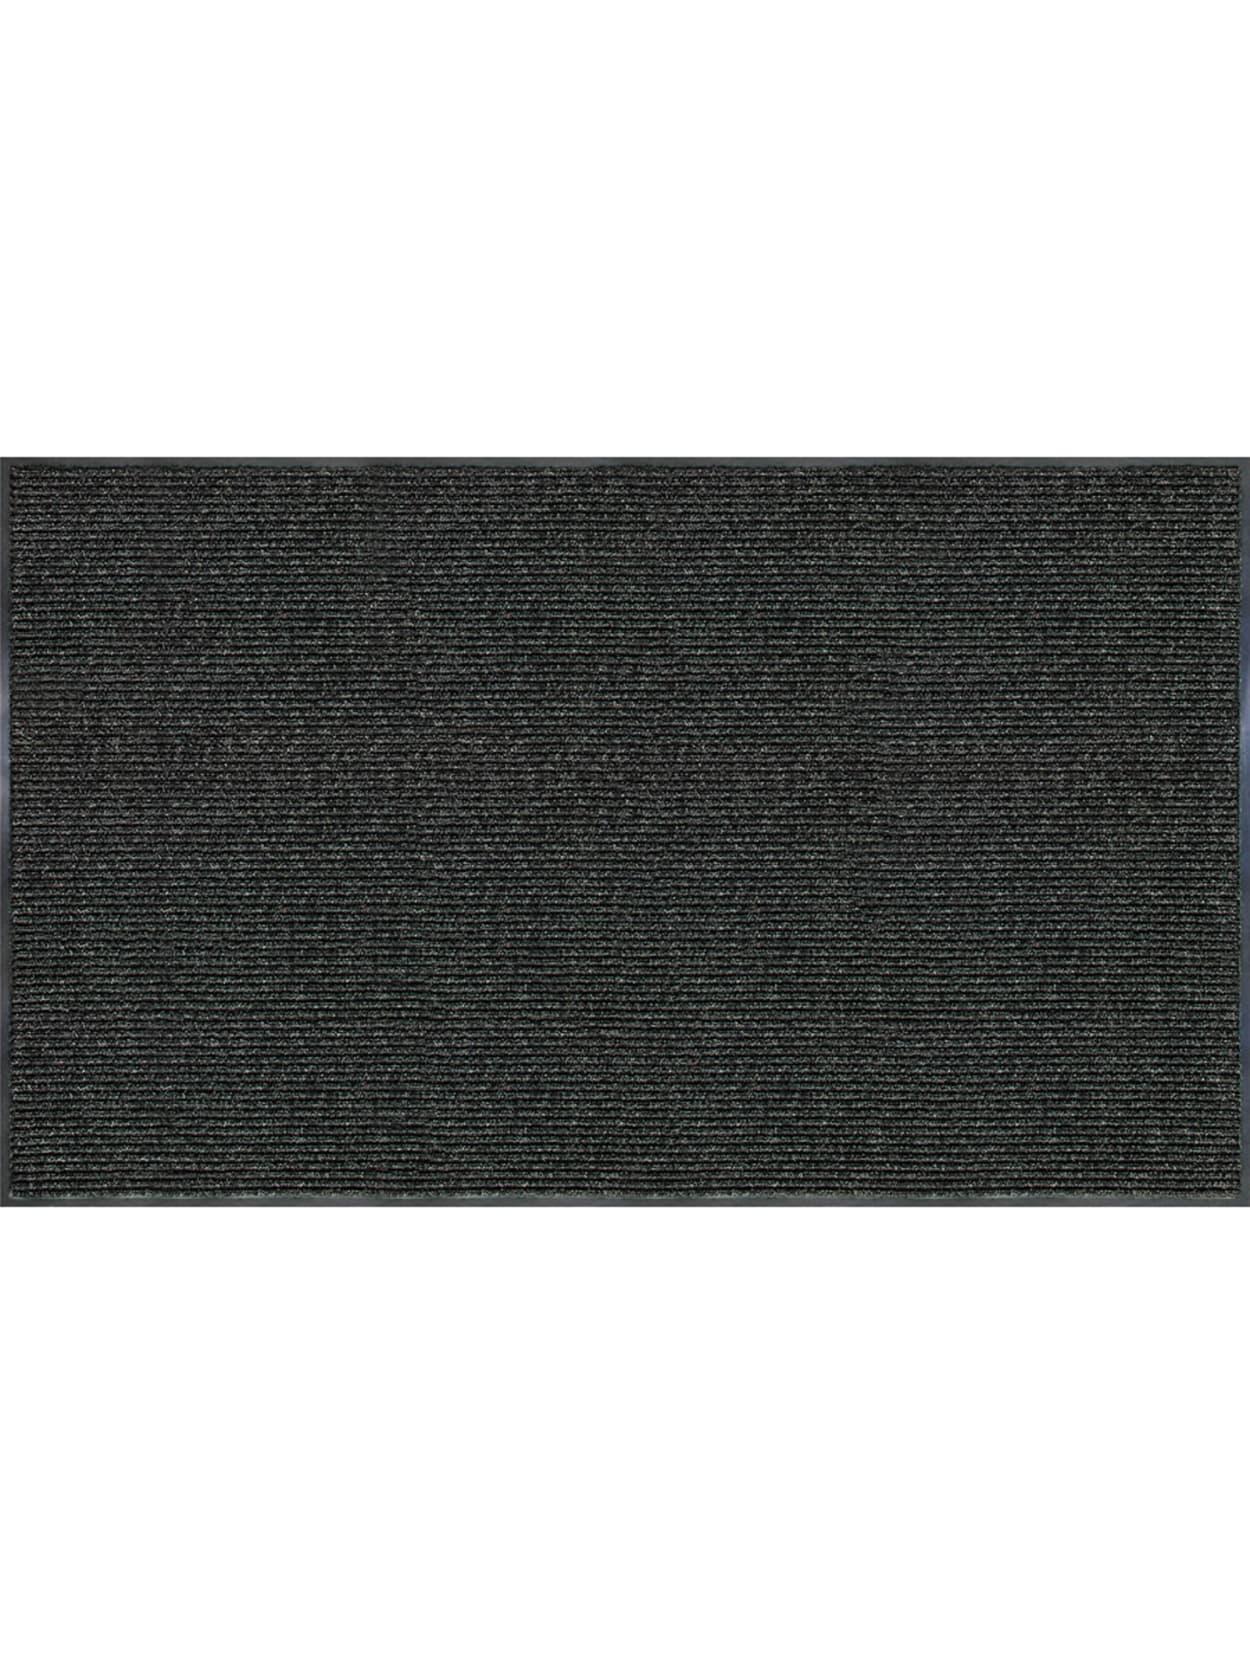 Reale Tough Rib Floor Mat 3 X 5